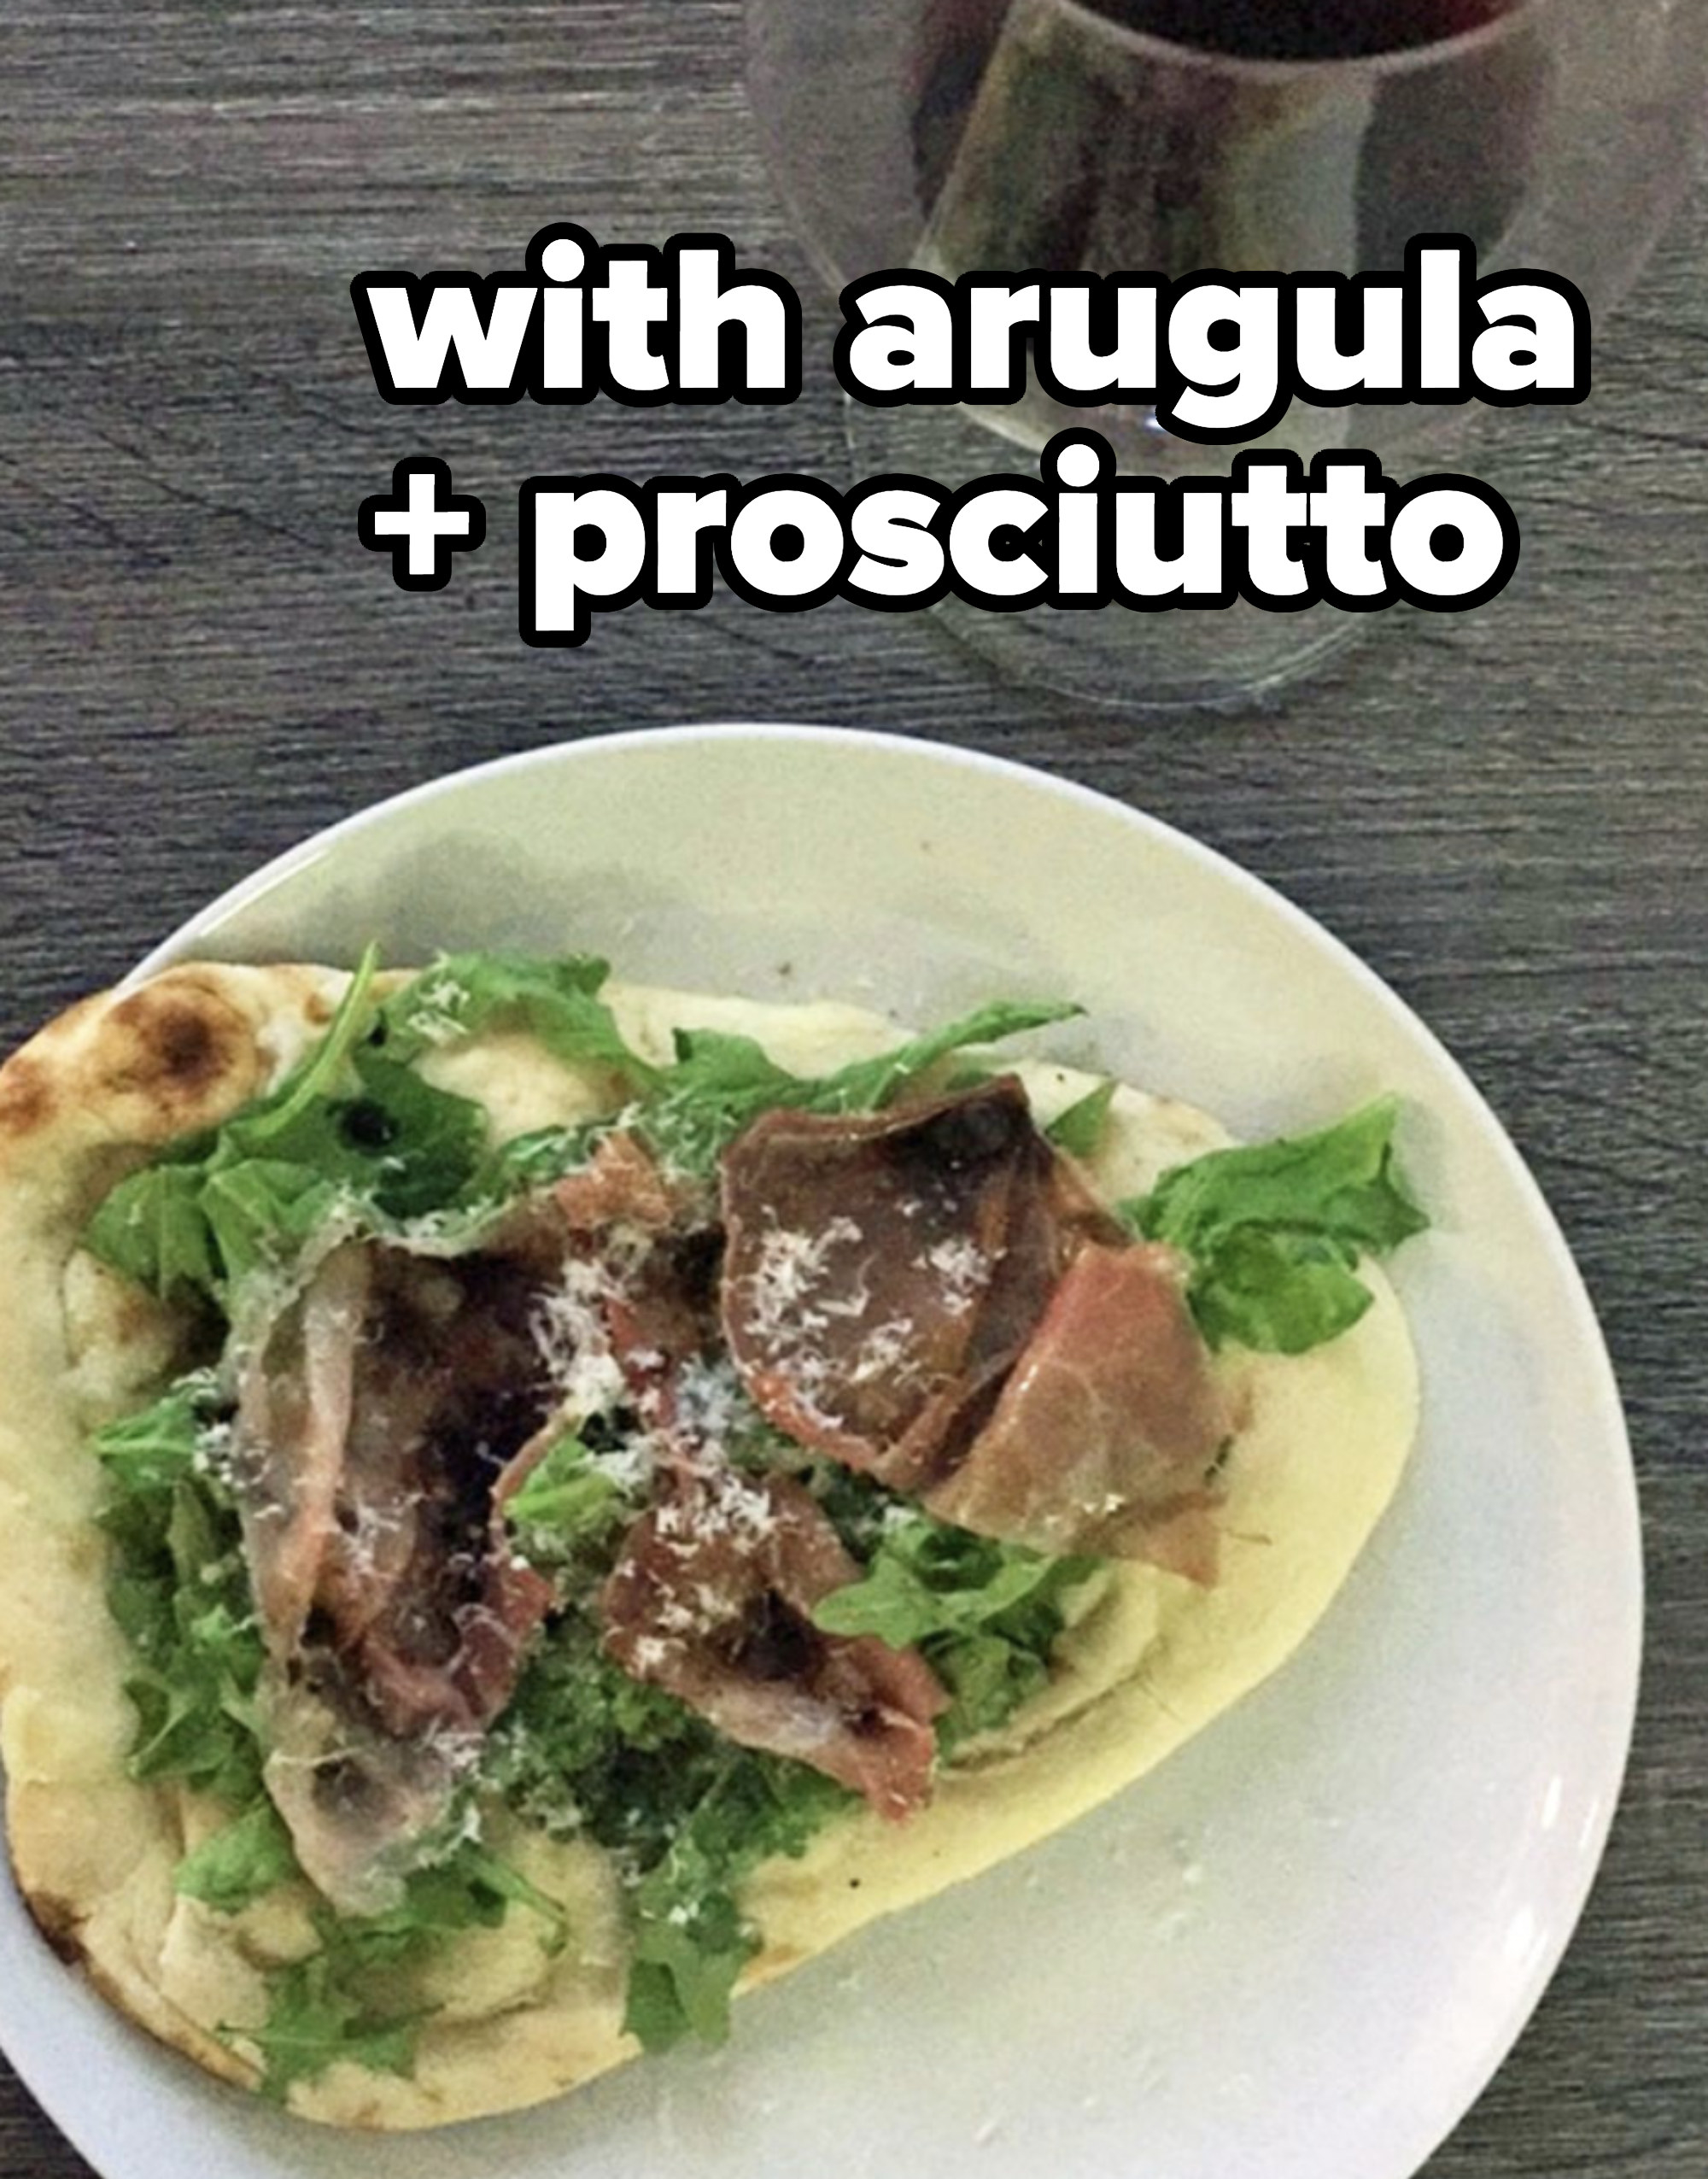 Naan pizza with arugula and prosciutto